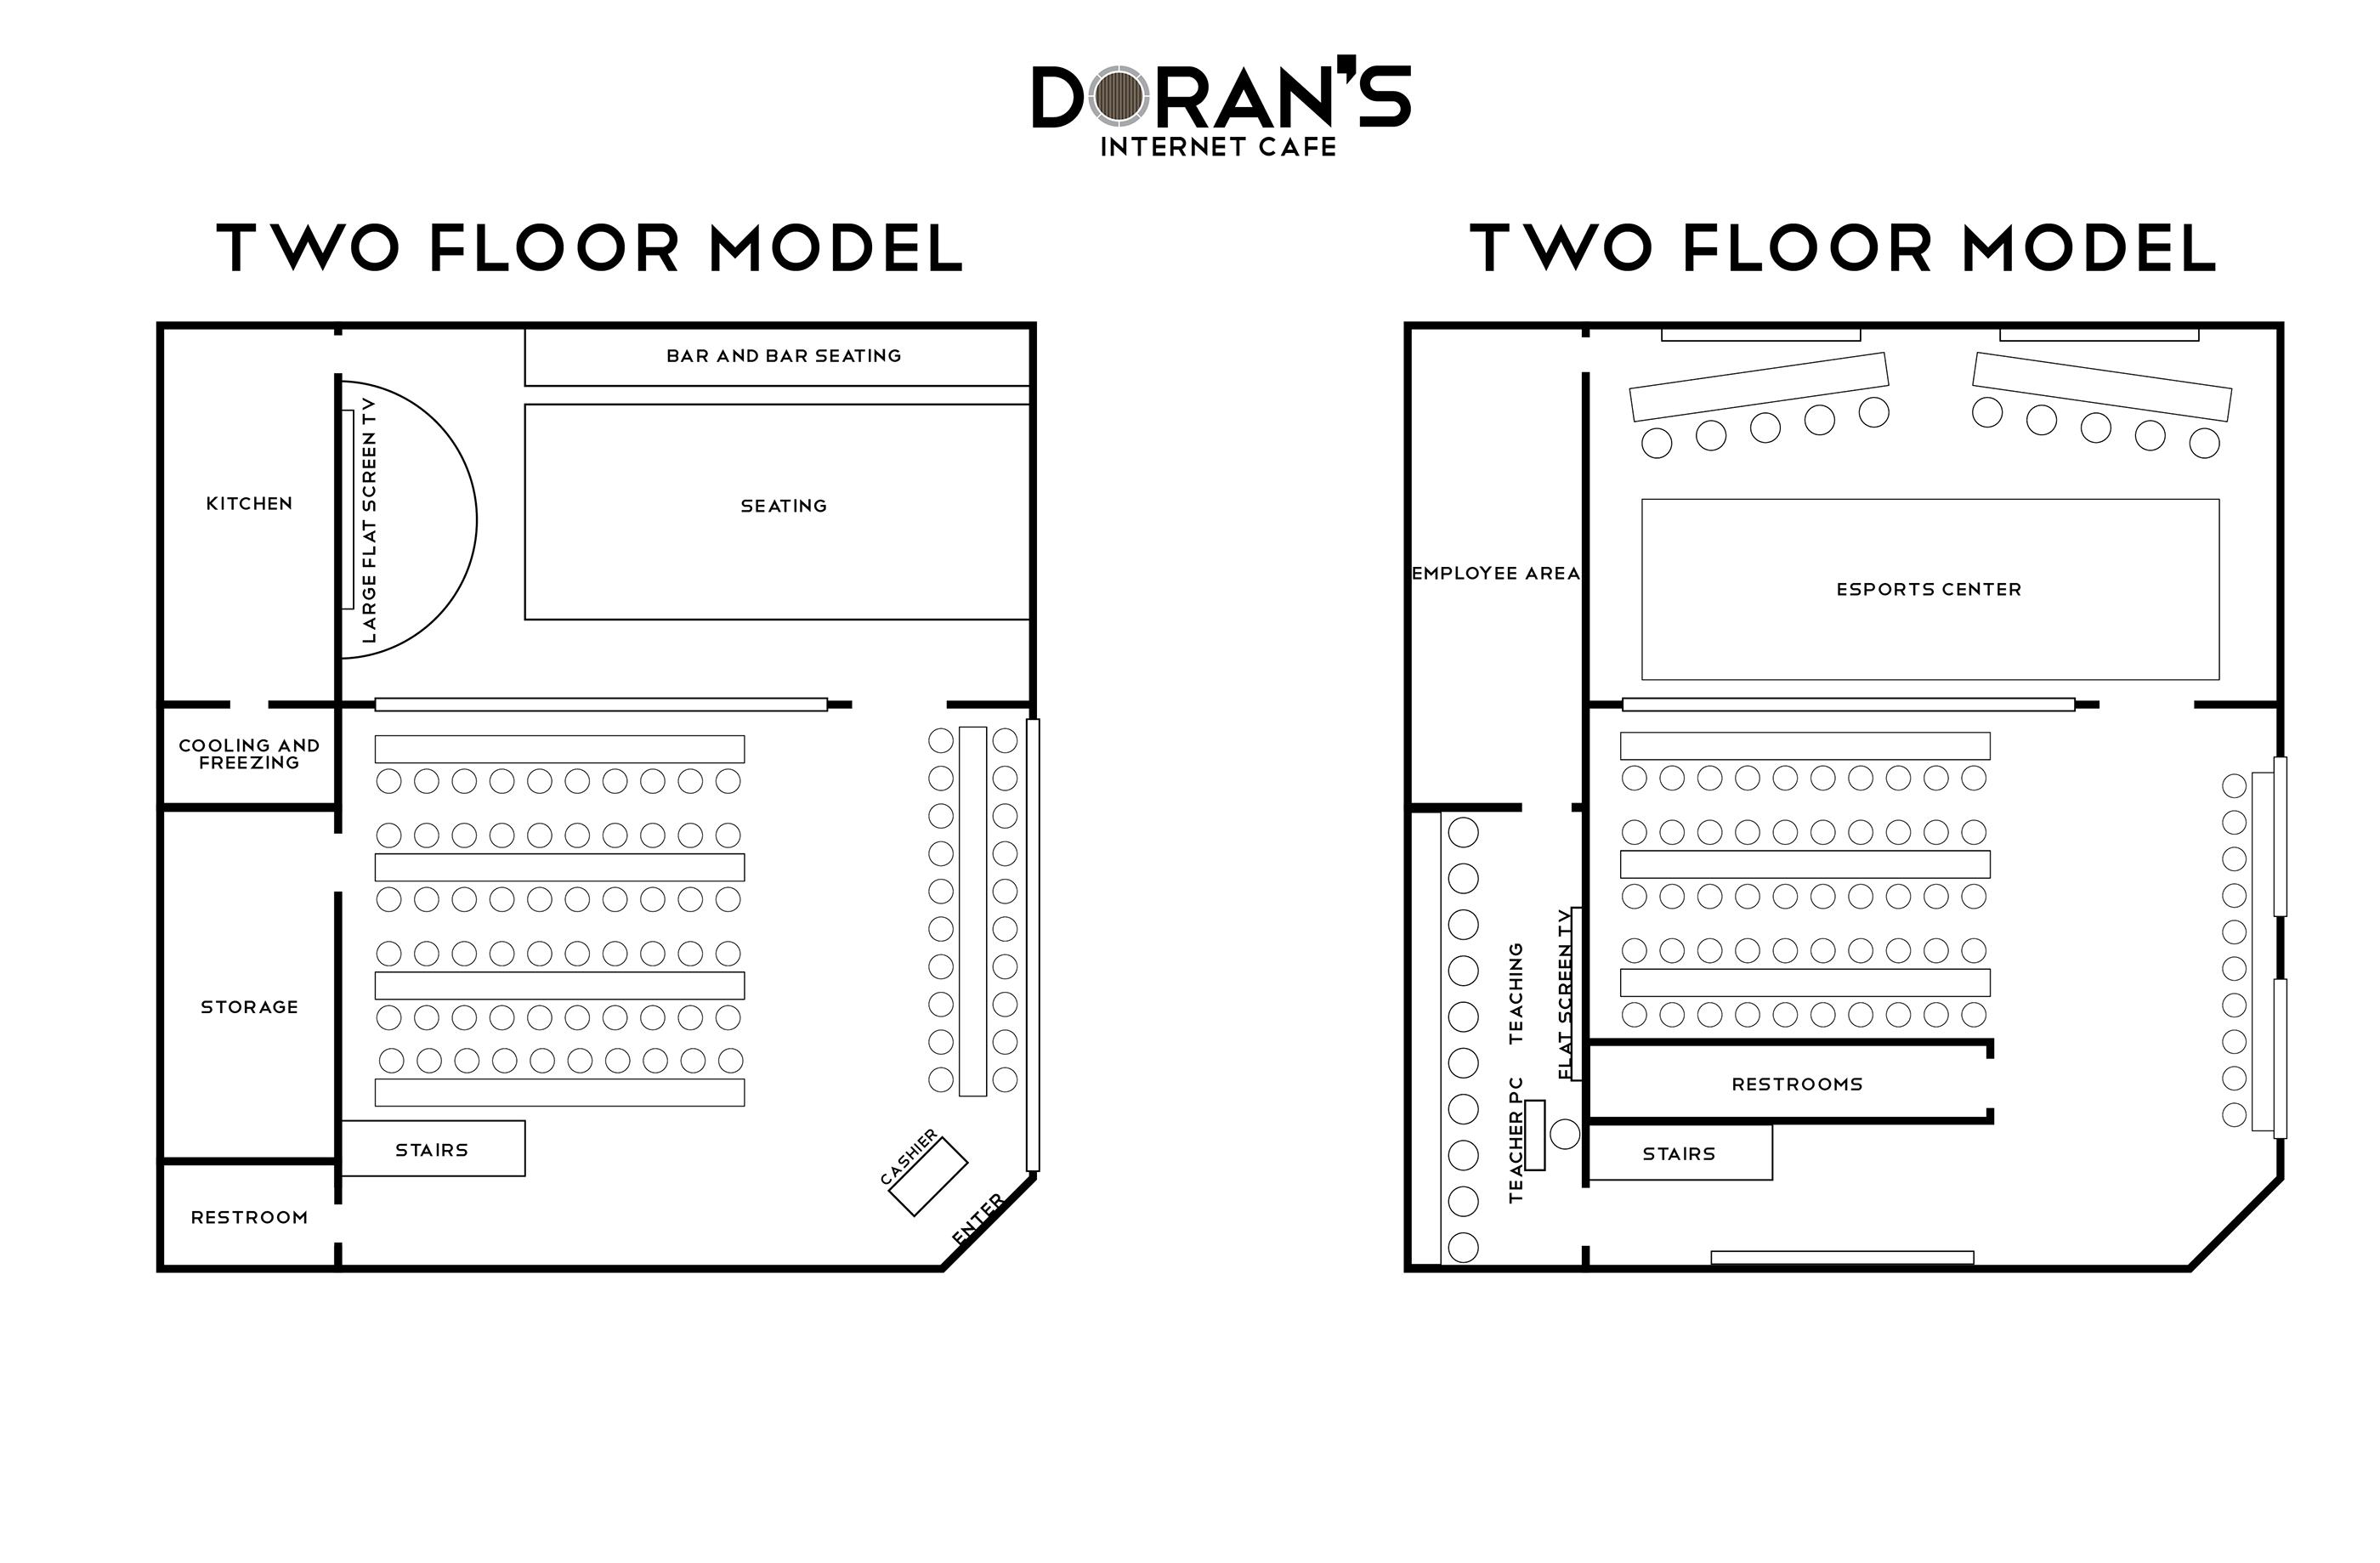 Doran S Internet Cafe Floor Plans On Behance